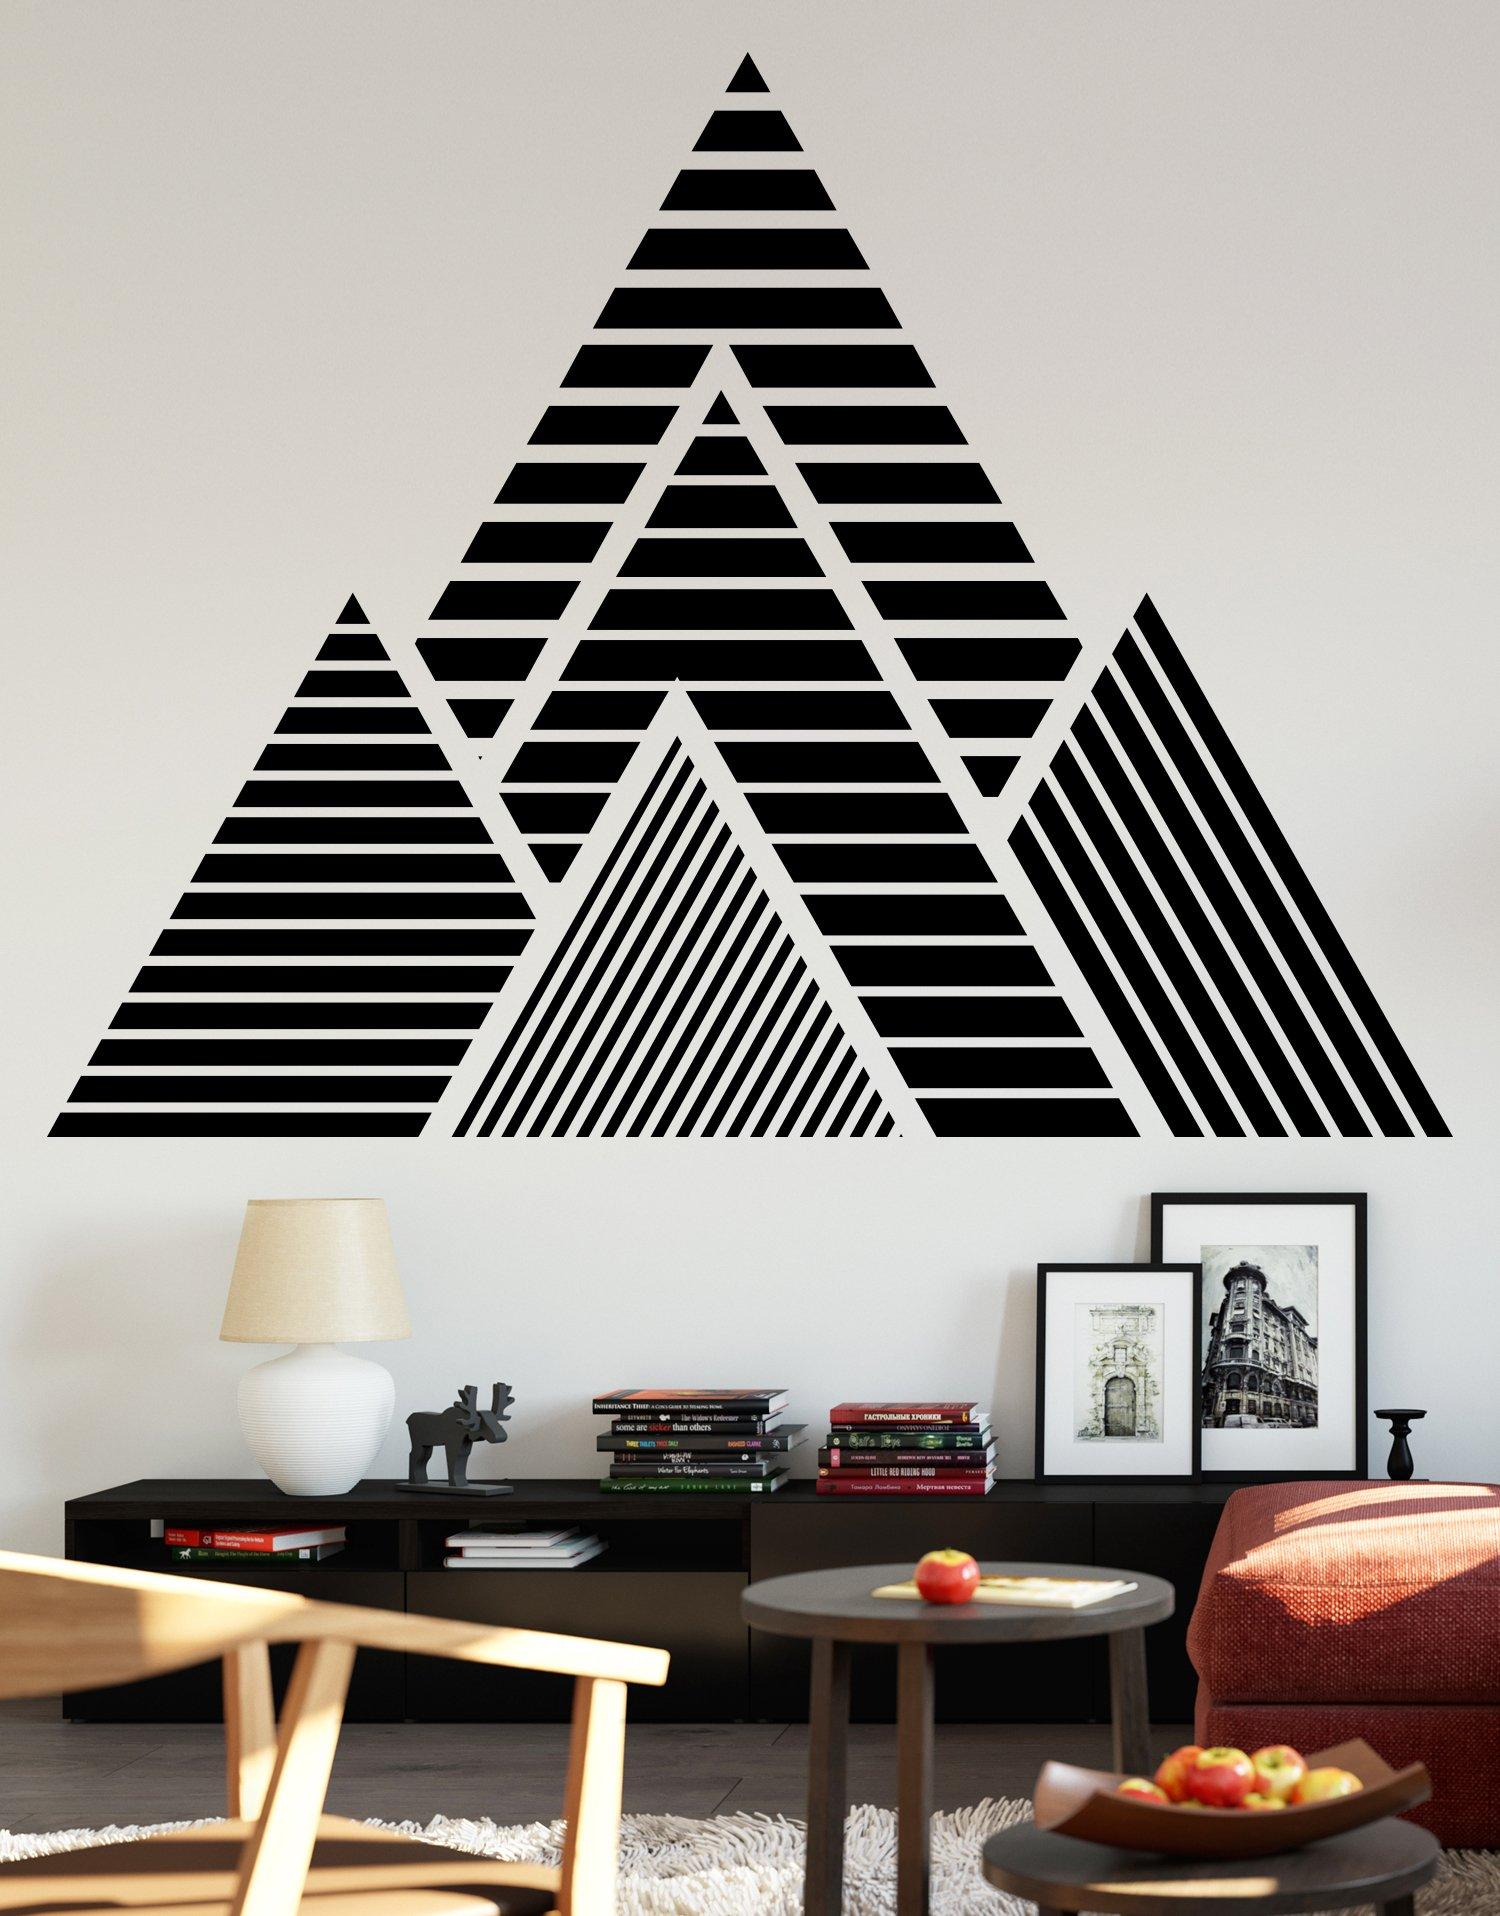 Geometric Mountains Vinyl Wall Decal Sticker  #OS_MB1247